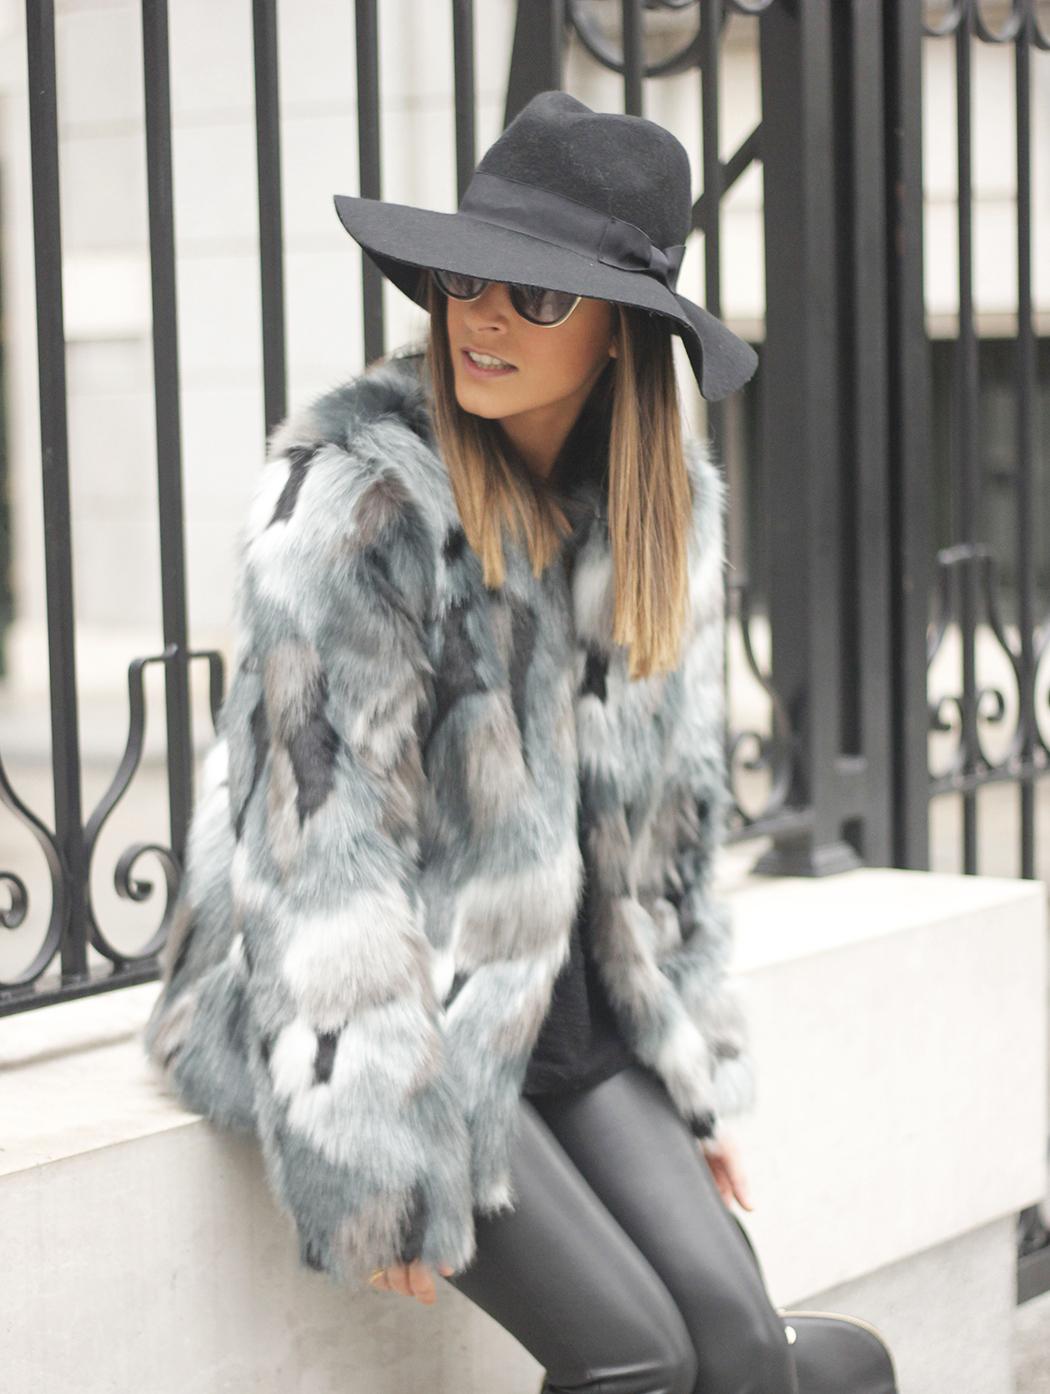 Faux fur coat leatherette pants booties black hat mango streetstyle fashion outfit08